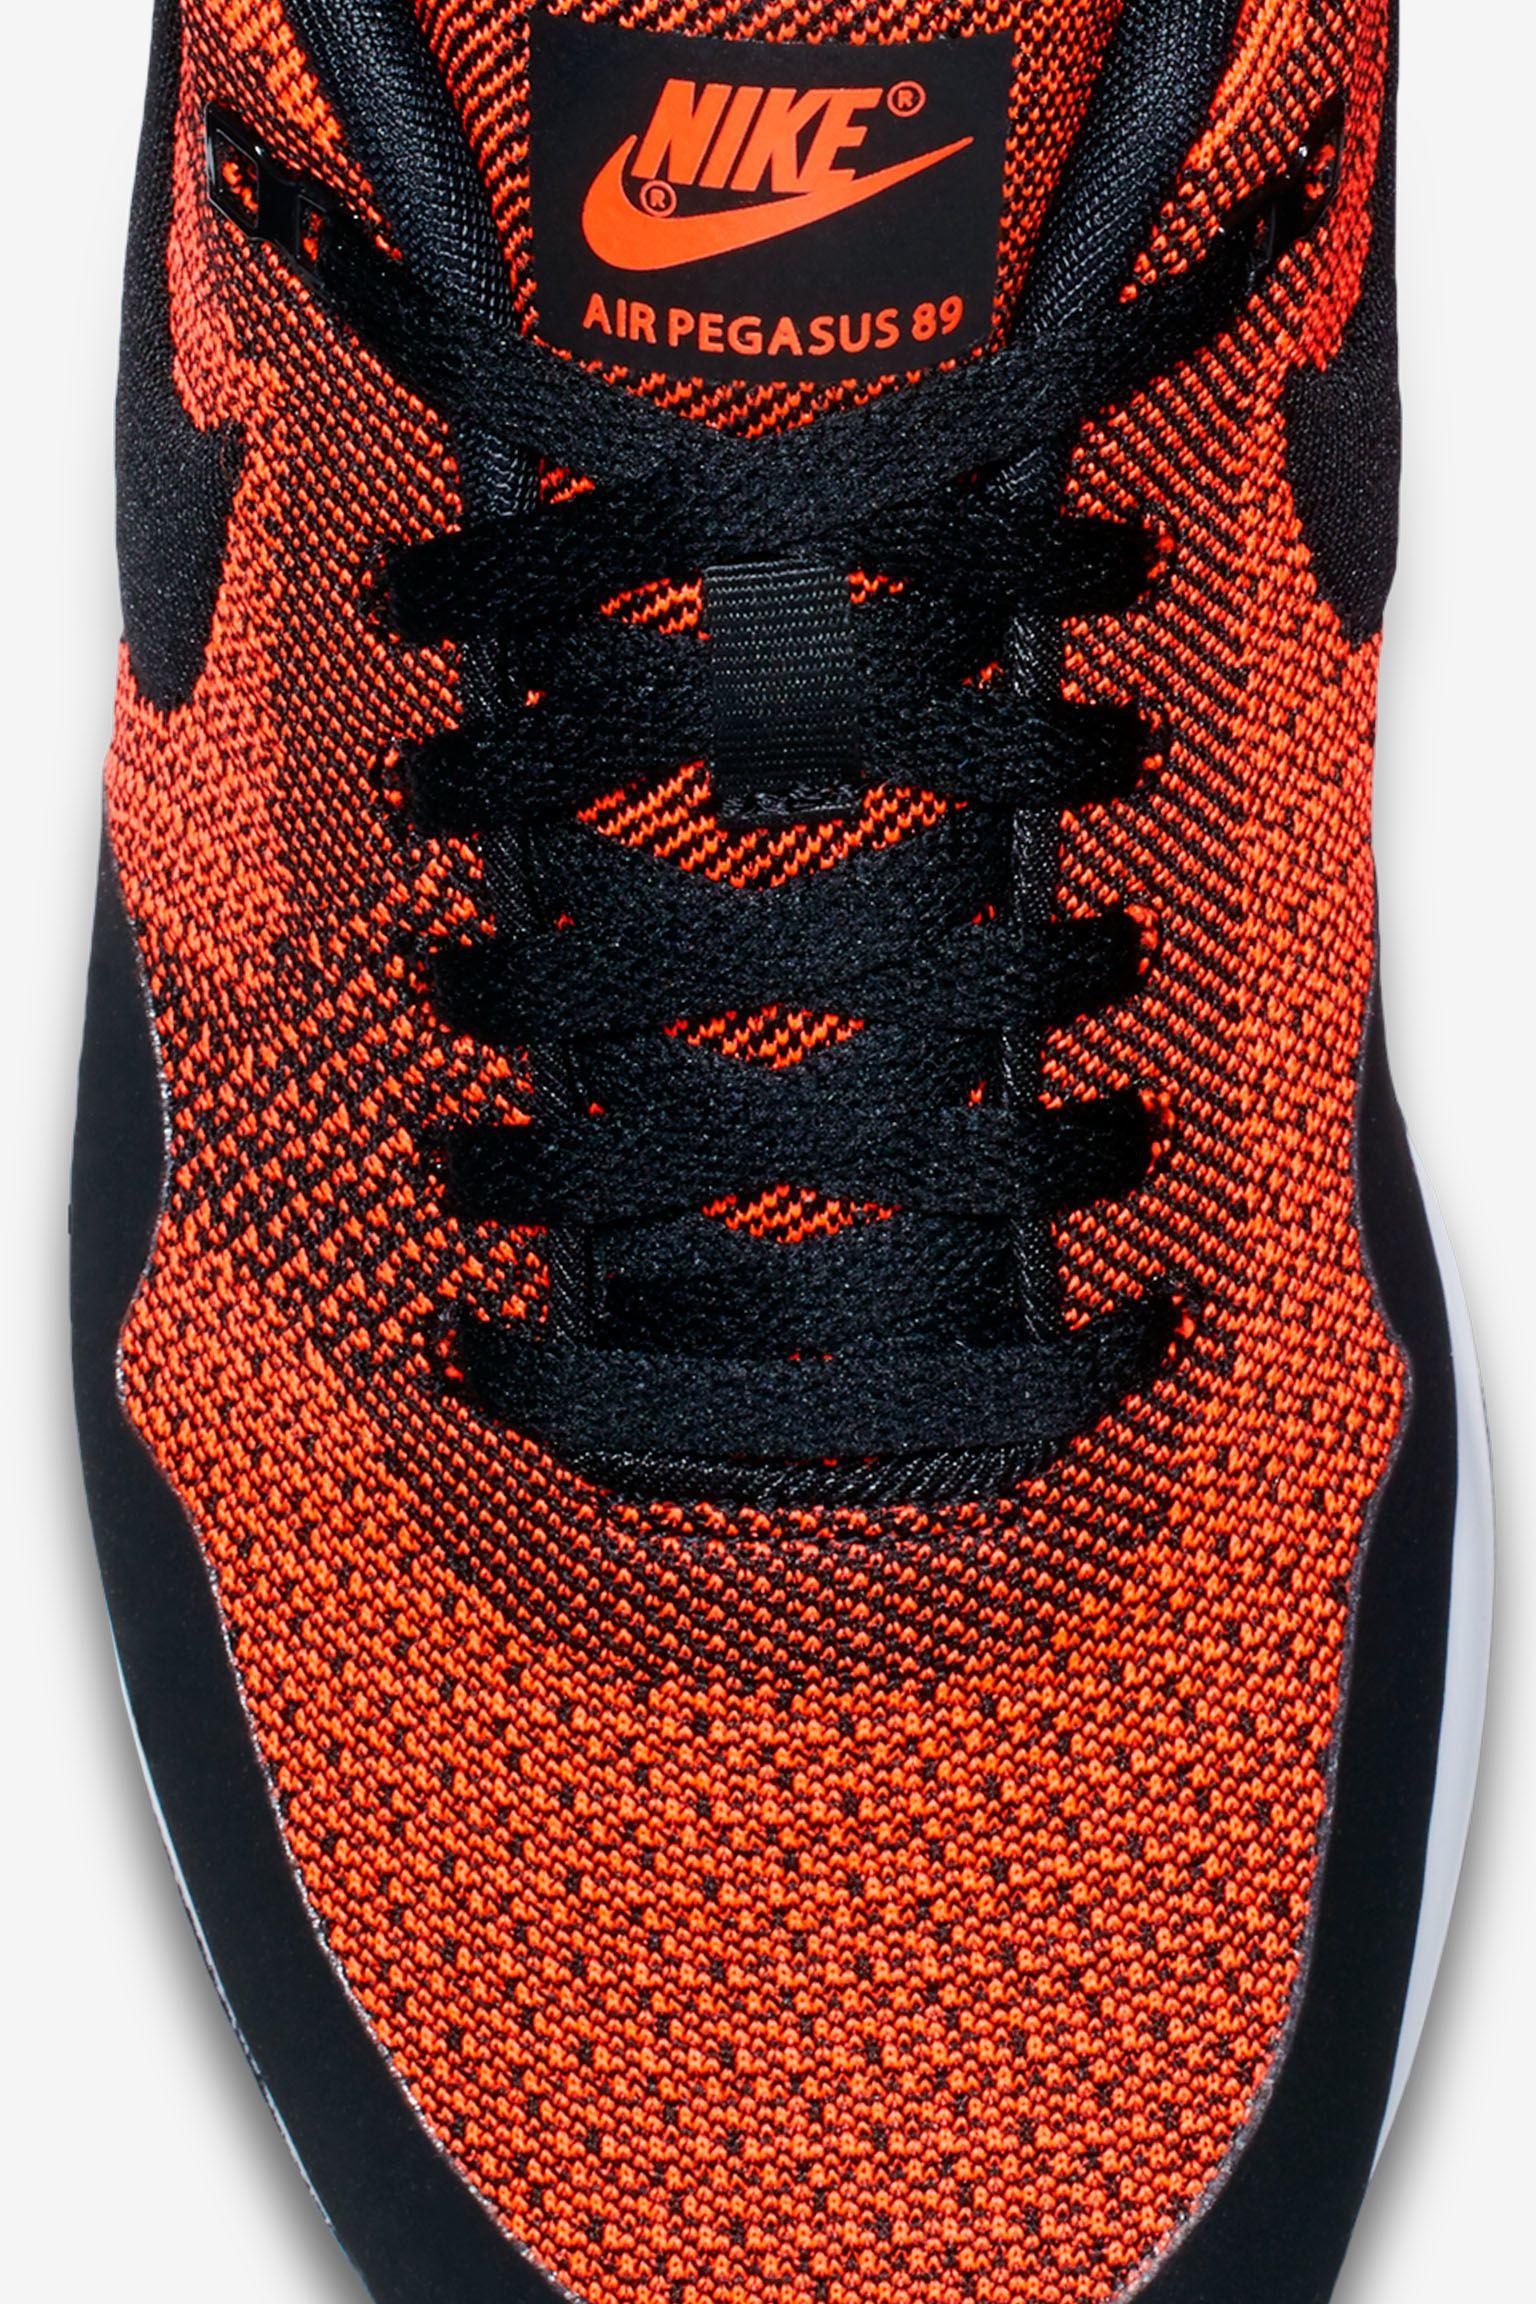 Nike Air Pegasus 89 Jacquard 'Crimson'